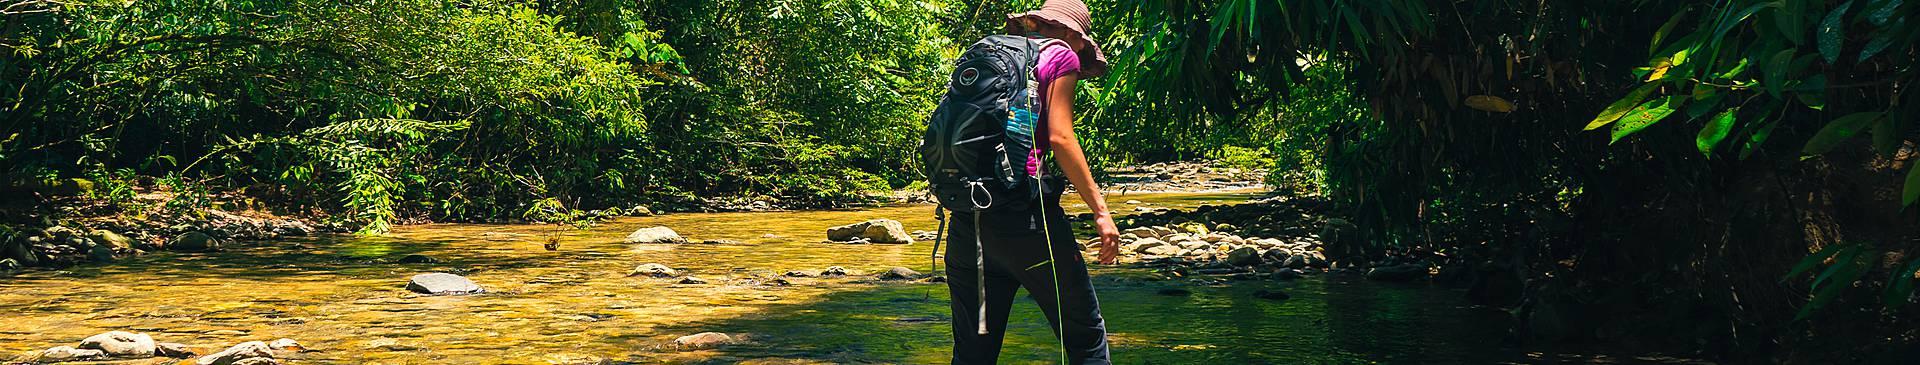 Trekking en Malasia